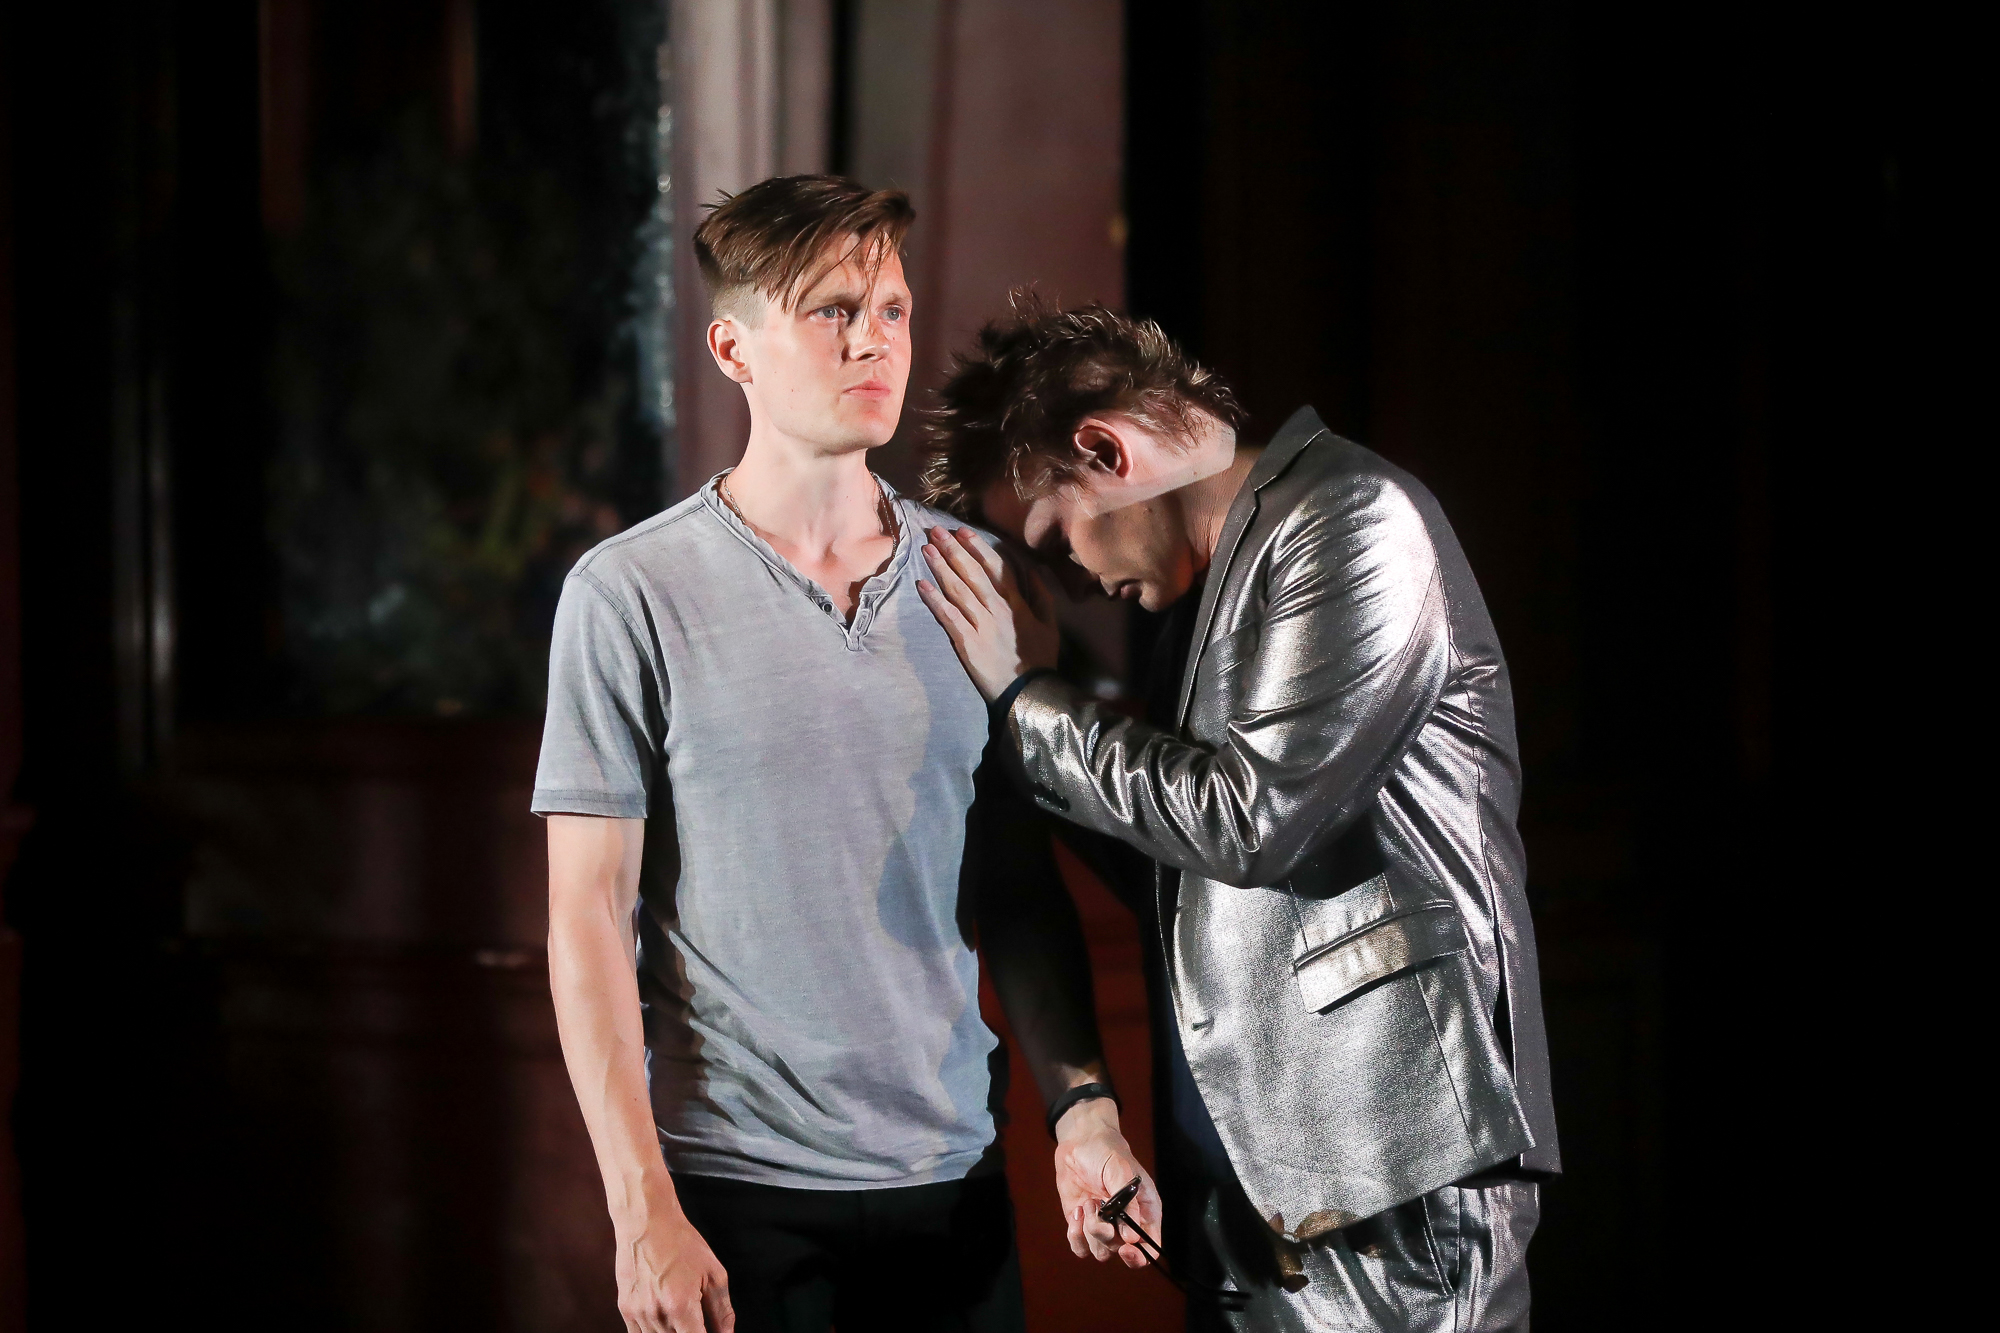 Photo of Sam Lilja as Romeo and Jeffrey Carlson as Mercutio in Romeo & Juliet by Tony Powell.